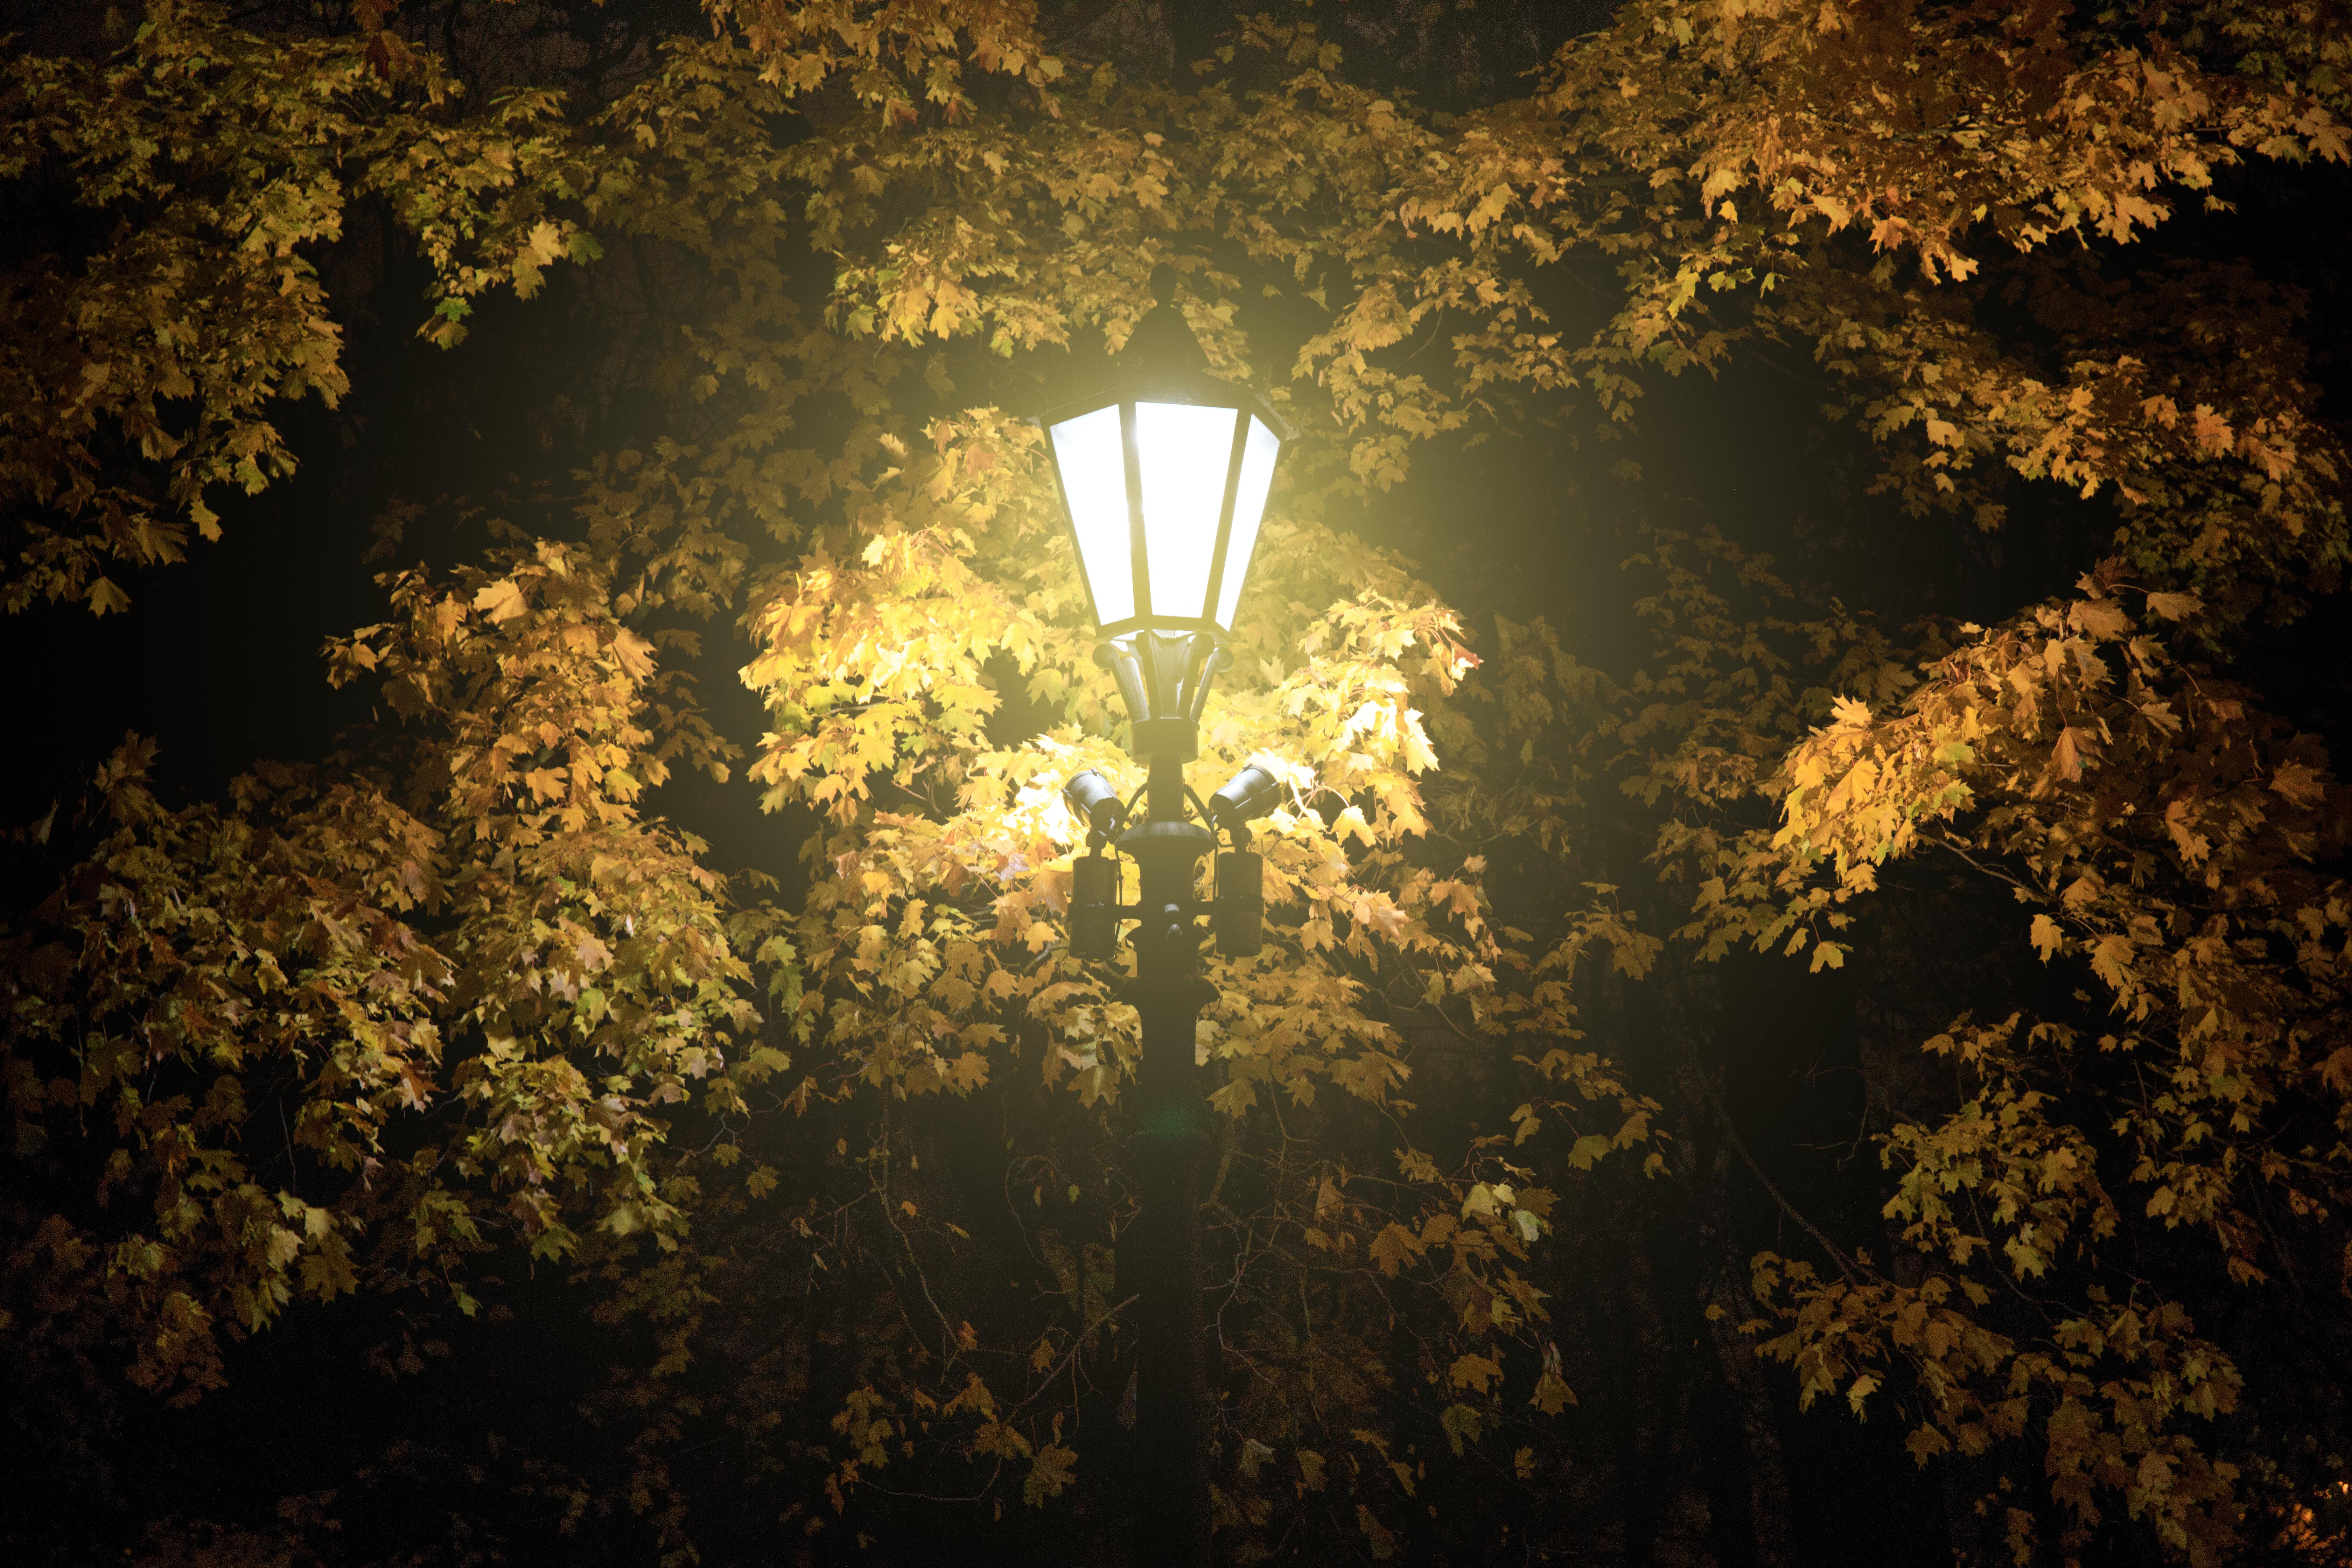 straatverlichting-in-bos.jpeg